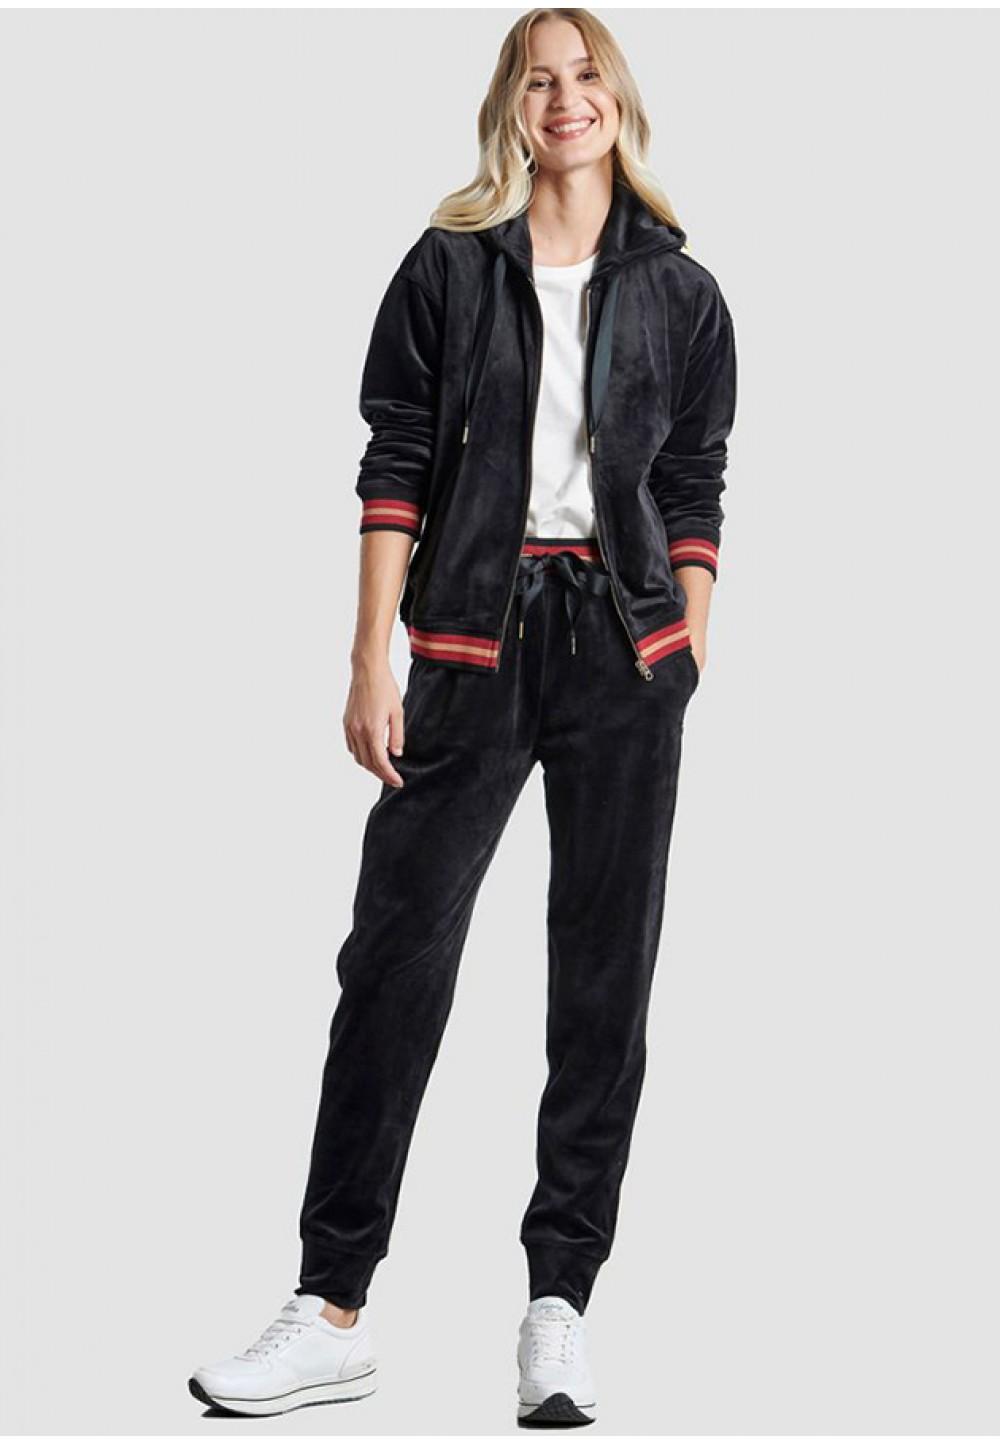 Бархатные женские брюки